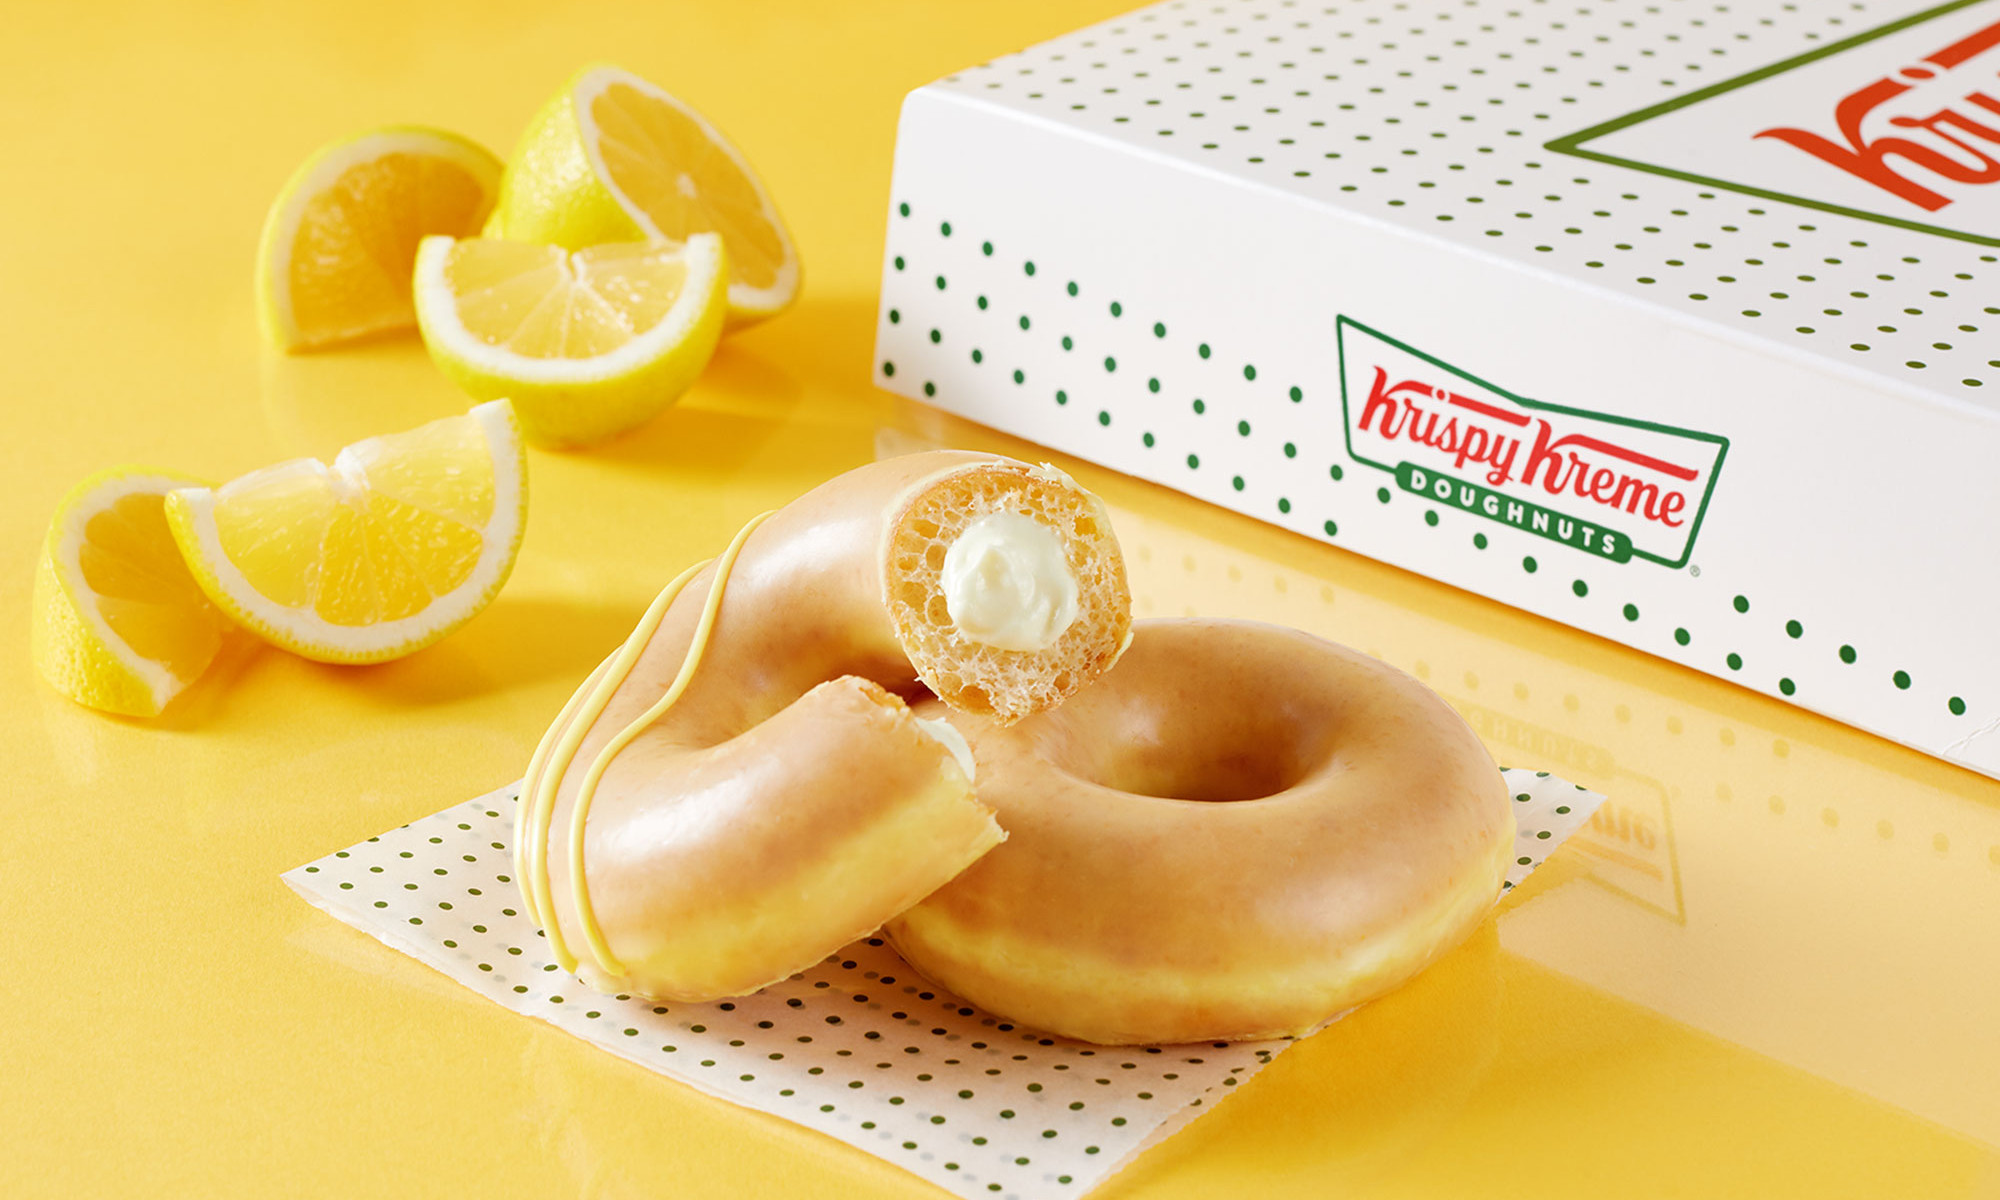 Professional commercial photography of lemon glazed Krispy Kreme doughnuts against yellow backdrop